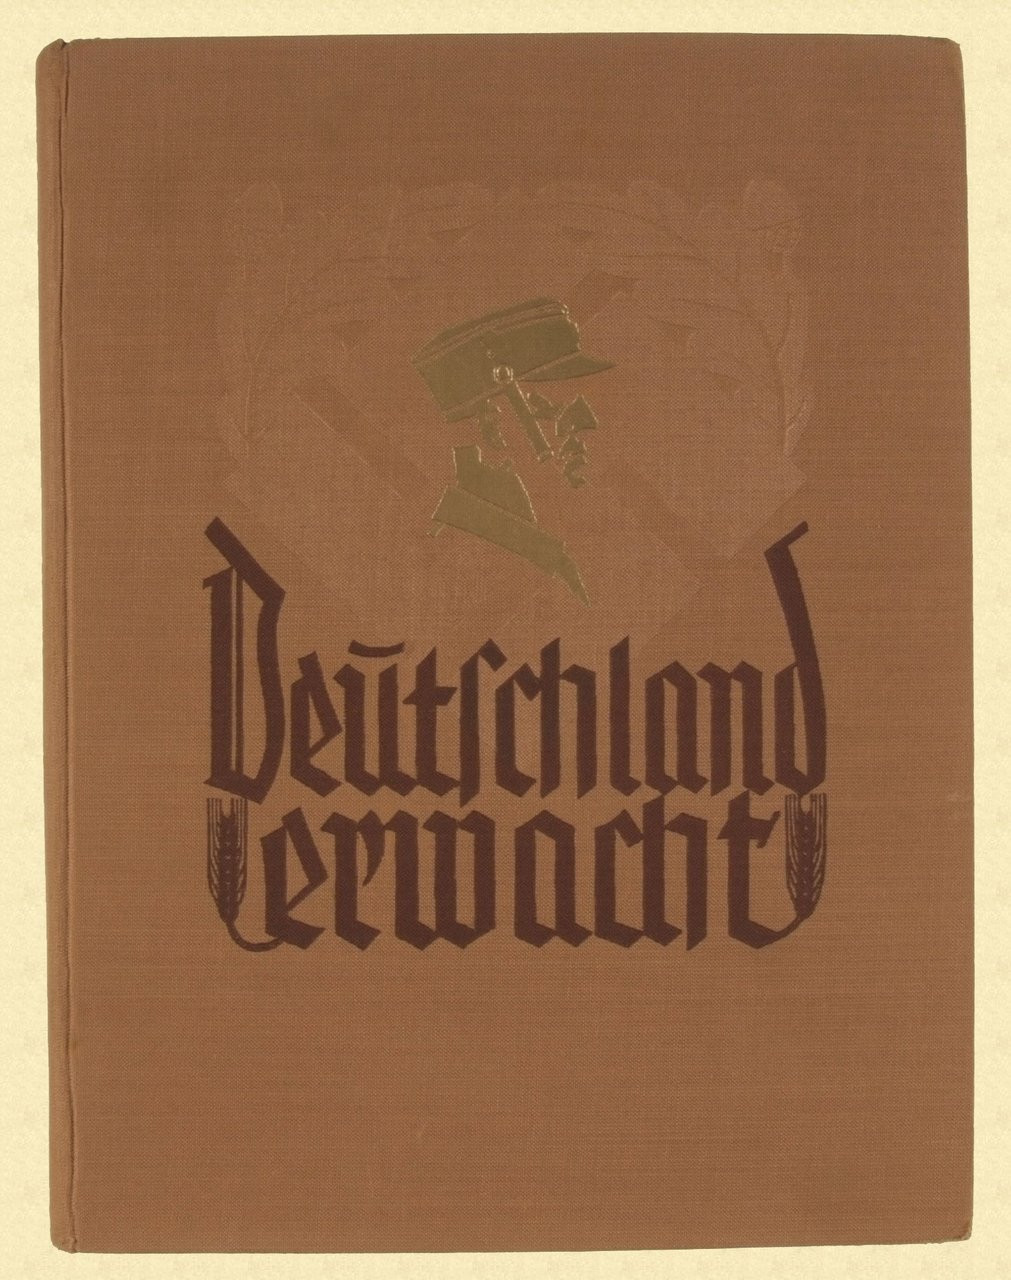 GERMAN WW2 BOOK - C11196